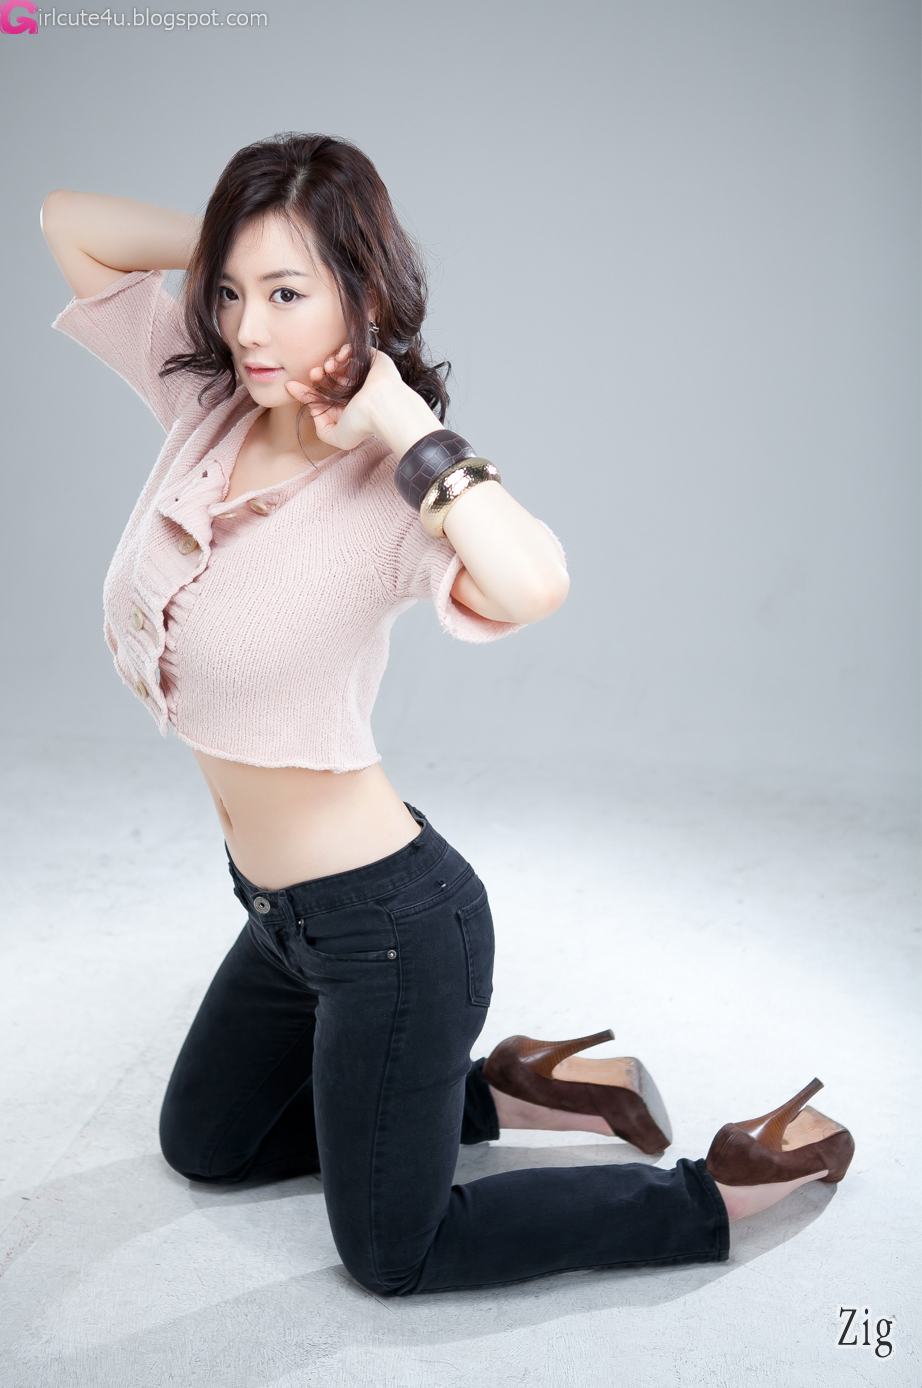 sexy-im-ji-hye-fotos-porno-notorious-msg-chinatown